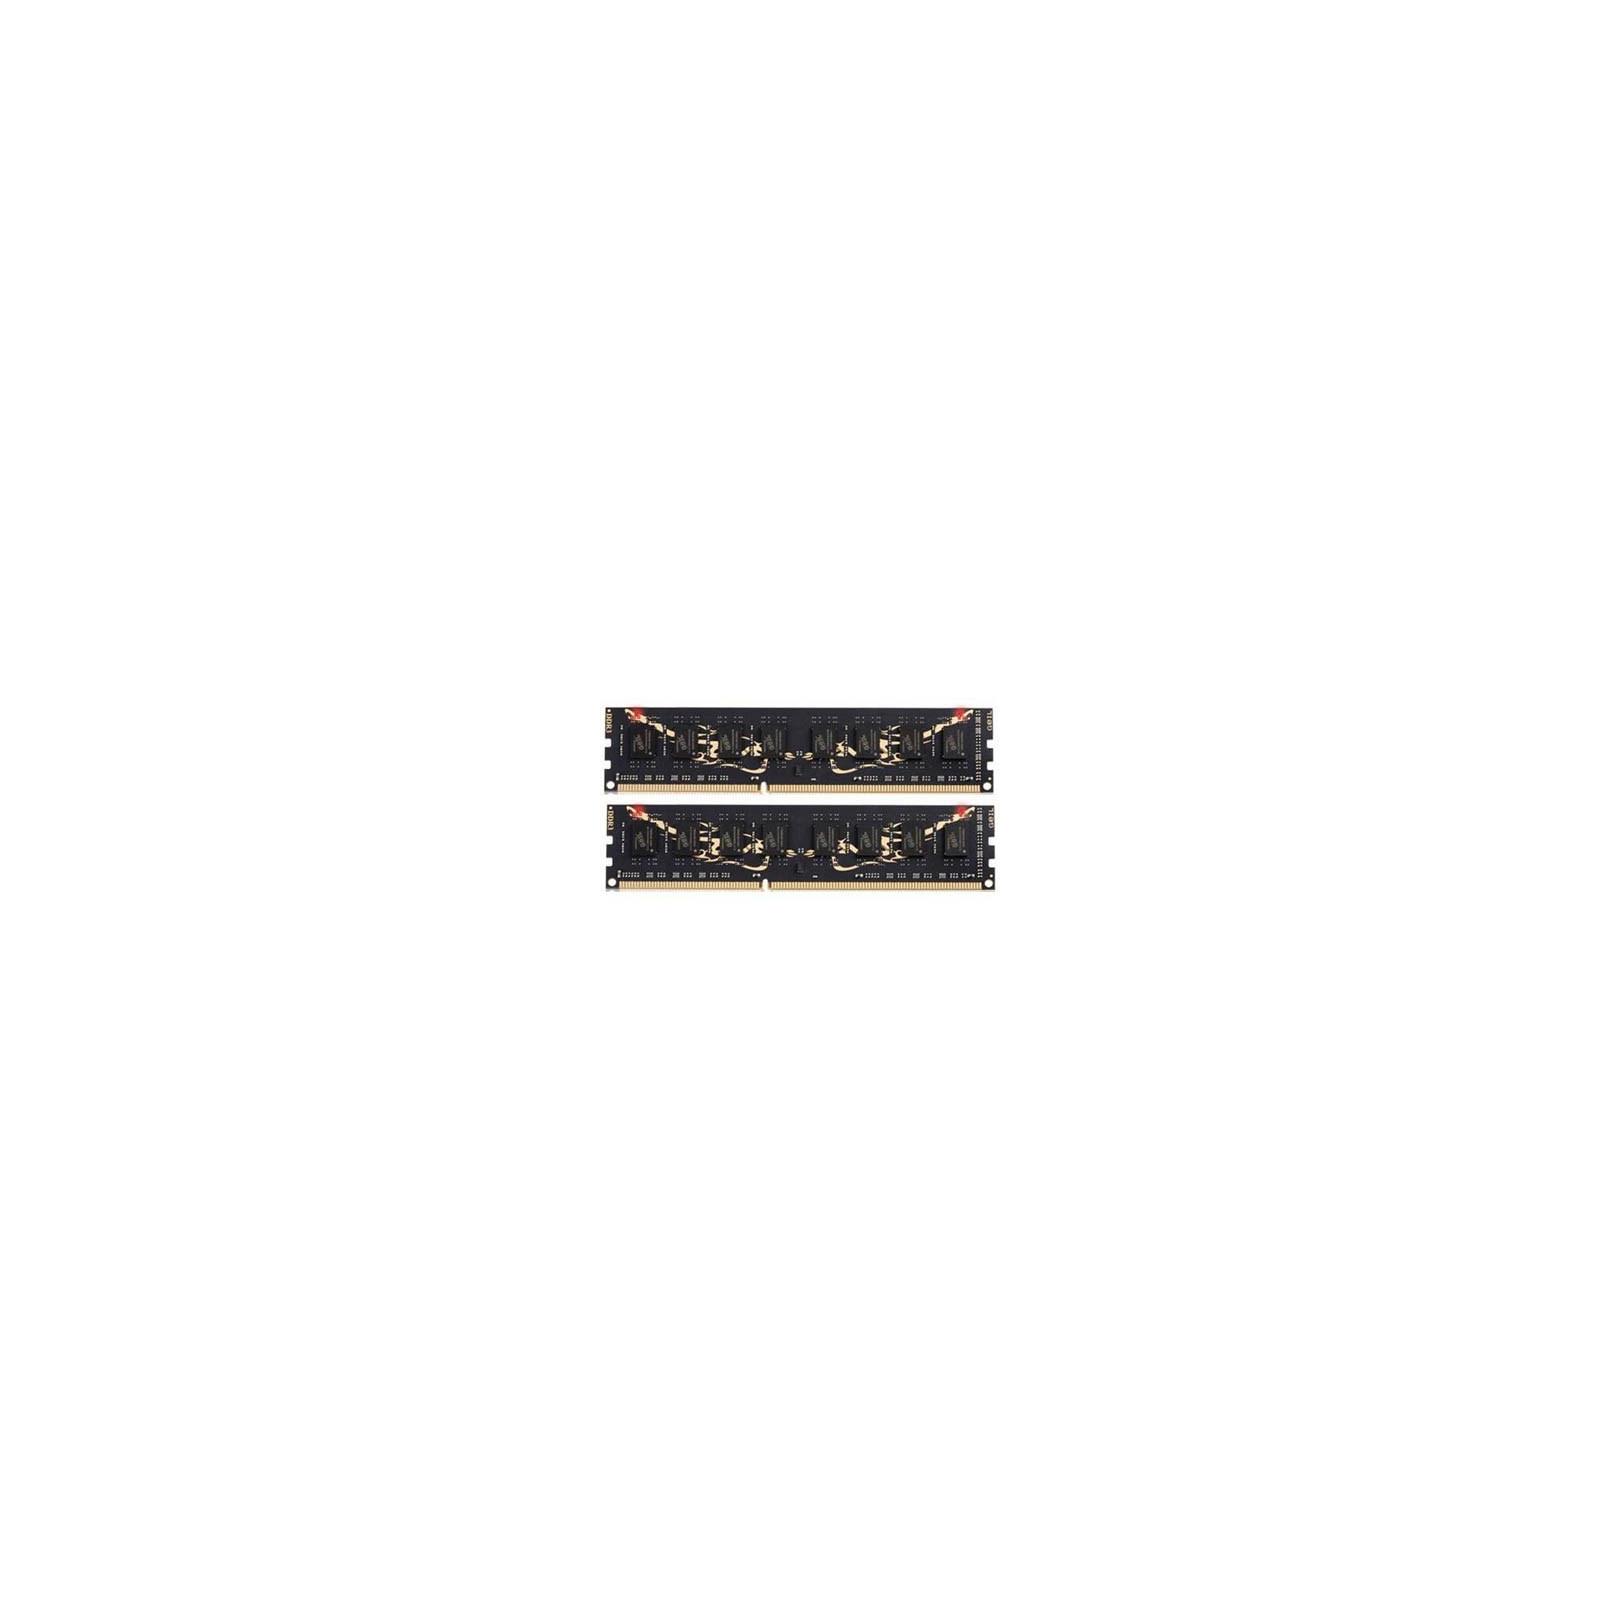 Модуль памяти для компьютера DDR3 8GB (2x4GB) 1333 MHz GEIL (GB38GB1333C7DC)